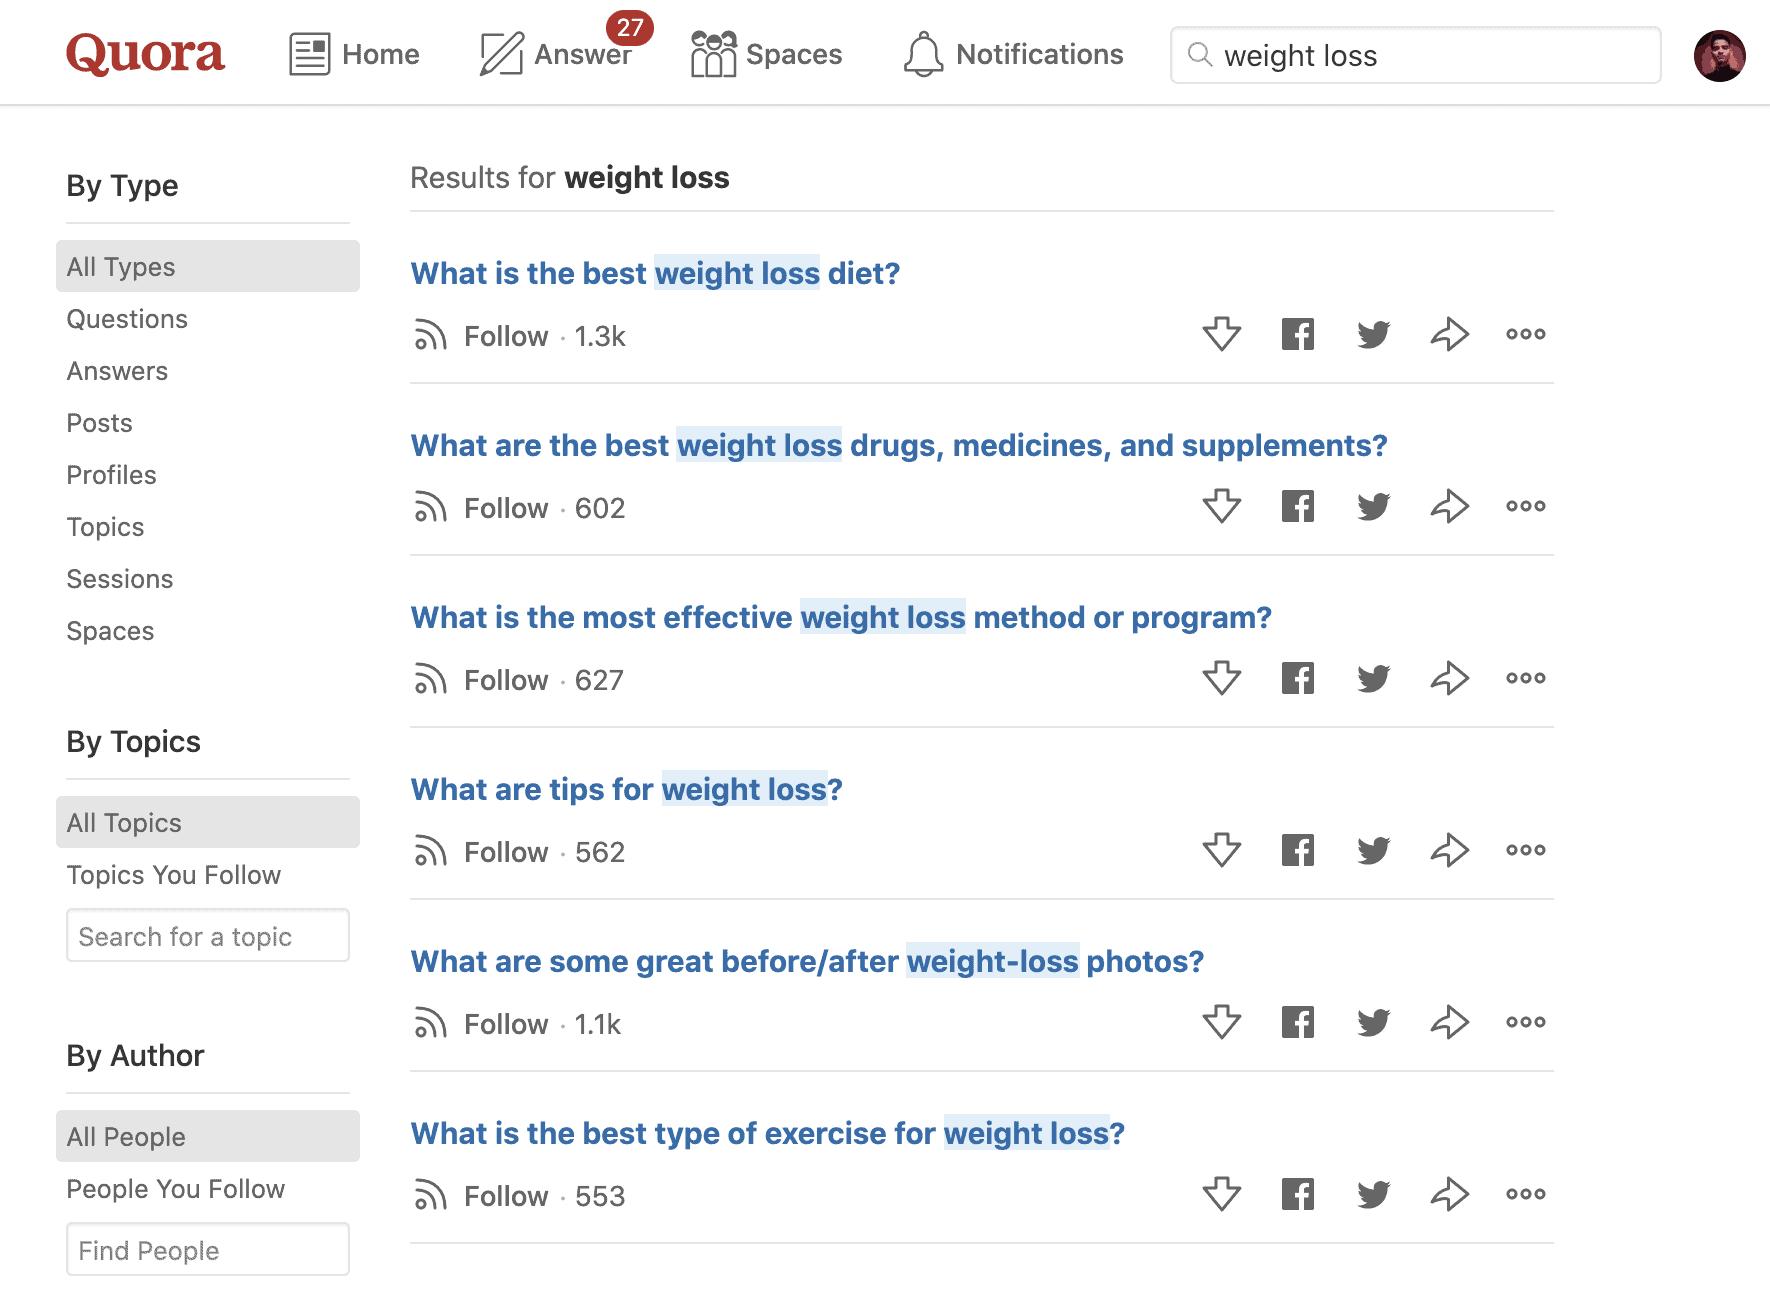 Quora Topic Search